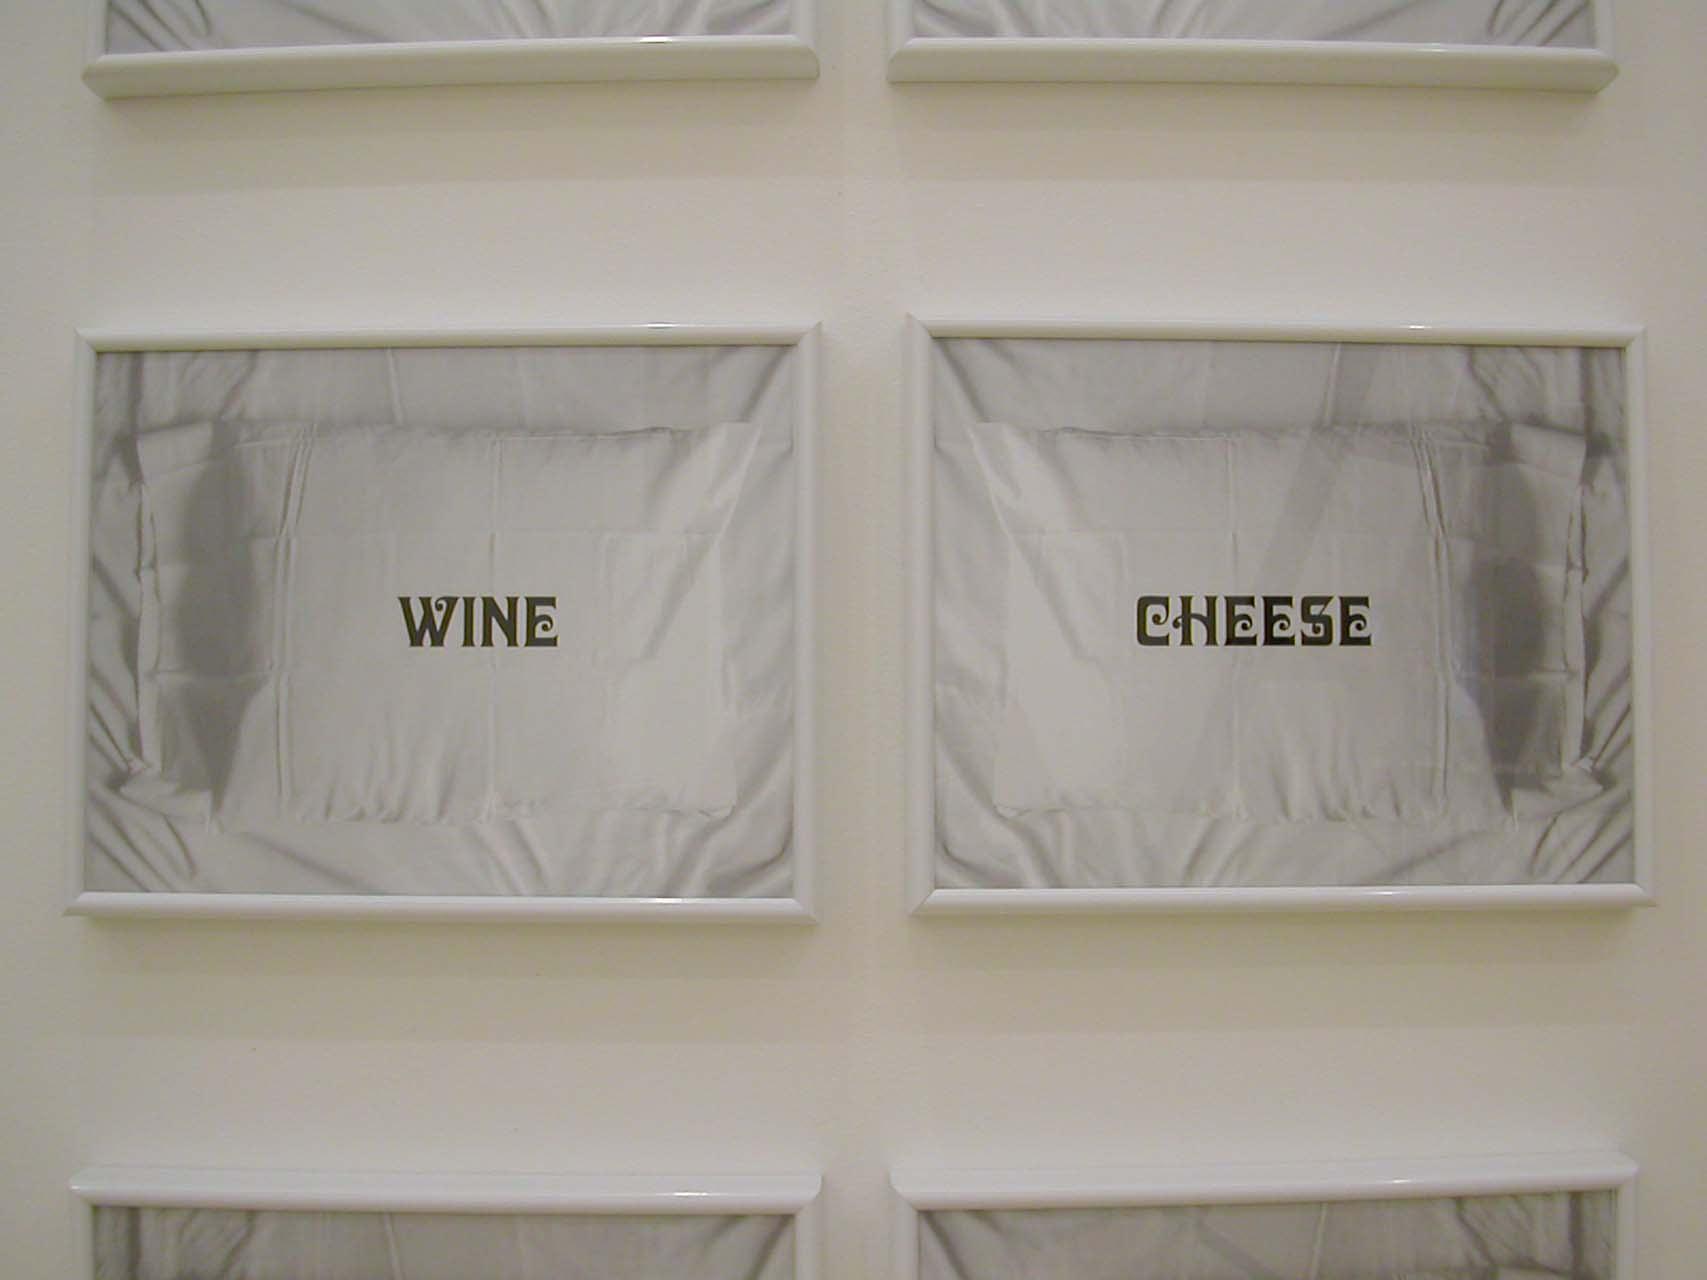 "<div class=""artwork_caption""><p>Wine & Cheese, 2002</p></div>"